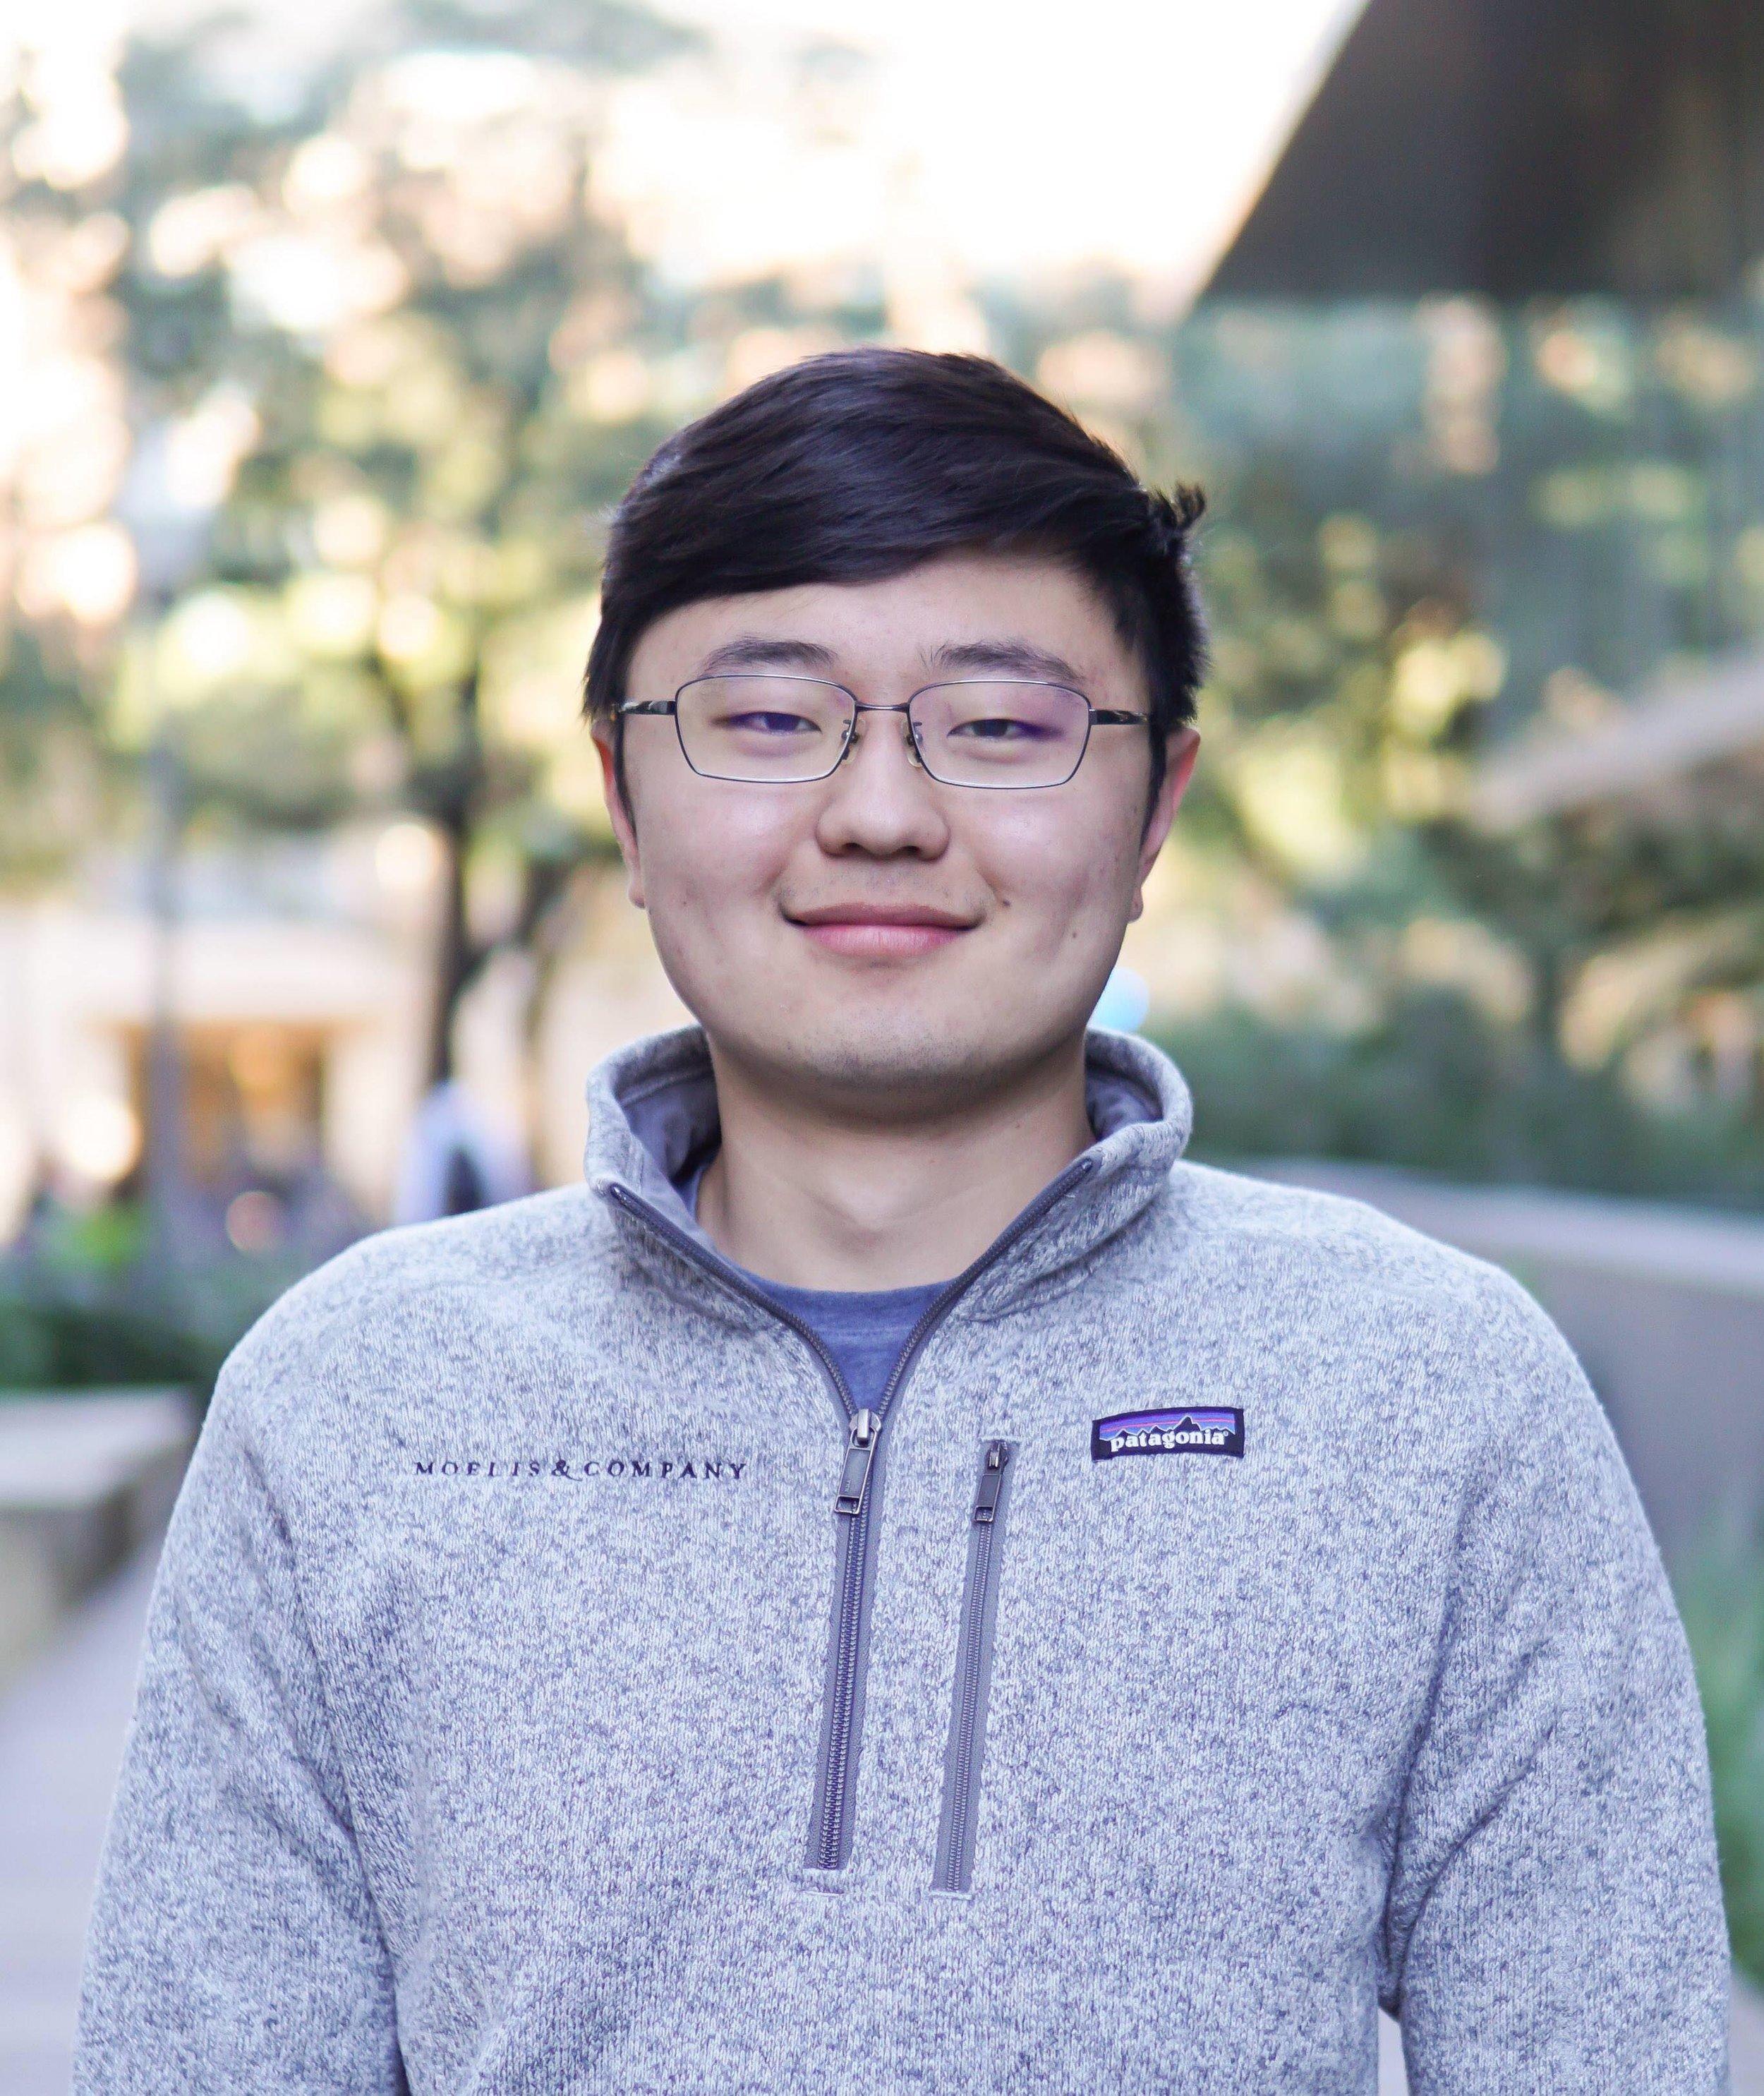 Daniel Chen    BHP, Finance Class of 2018   Moelis & Company (NYC)